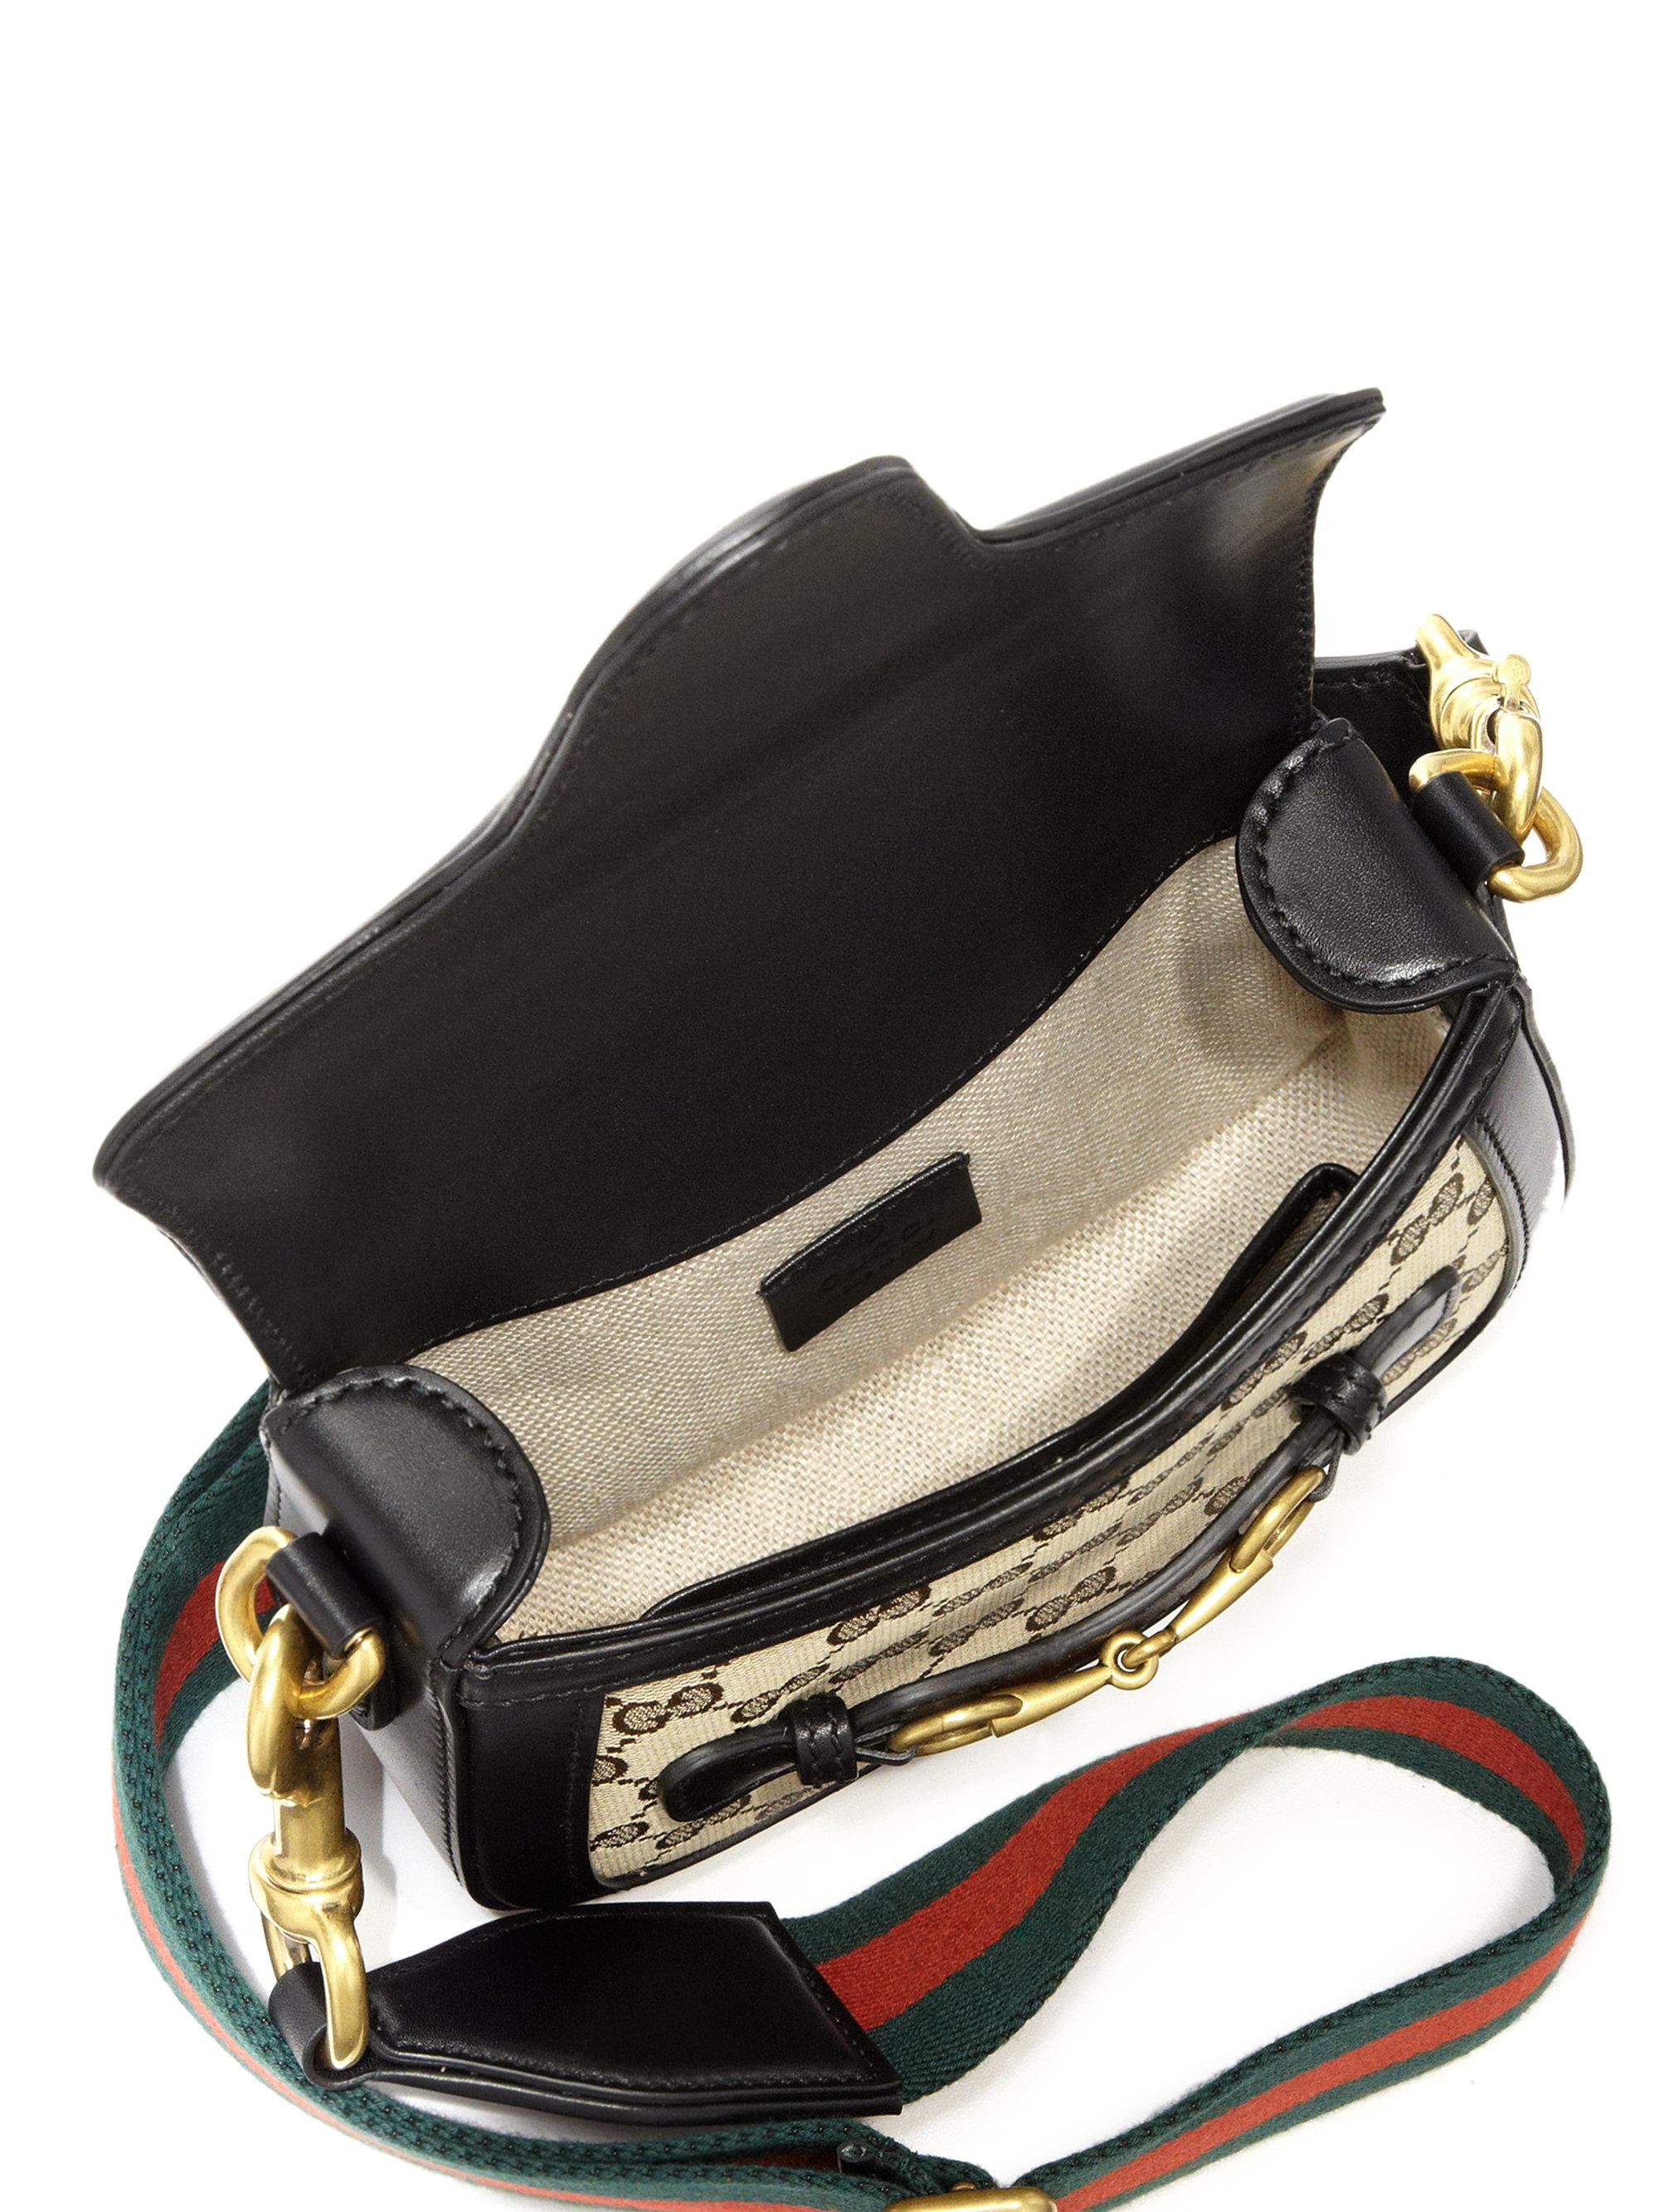 d70d84e70a5 Lyst Gucci Lady Web Small Gg Supreme Canvas Shoulder Bag In Natural